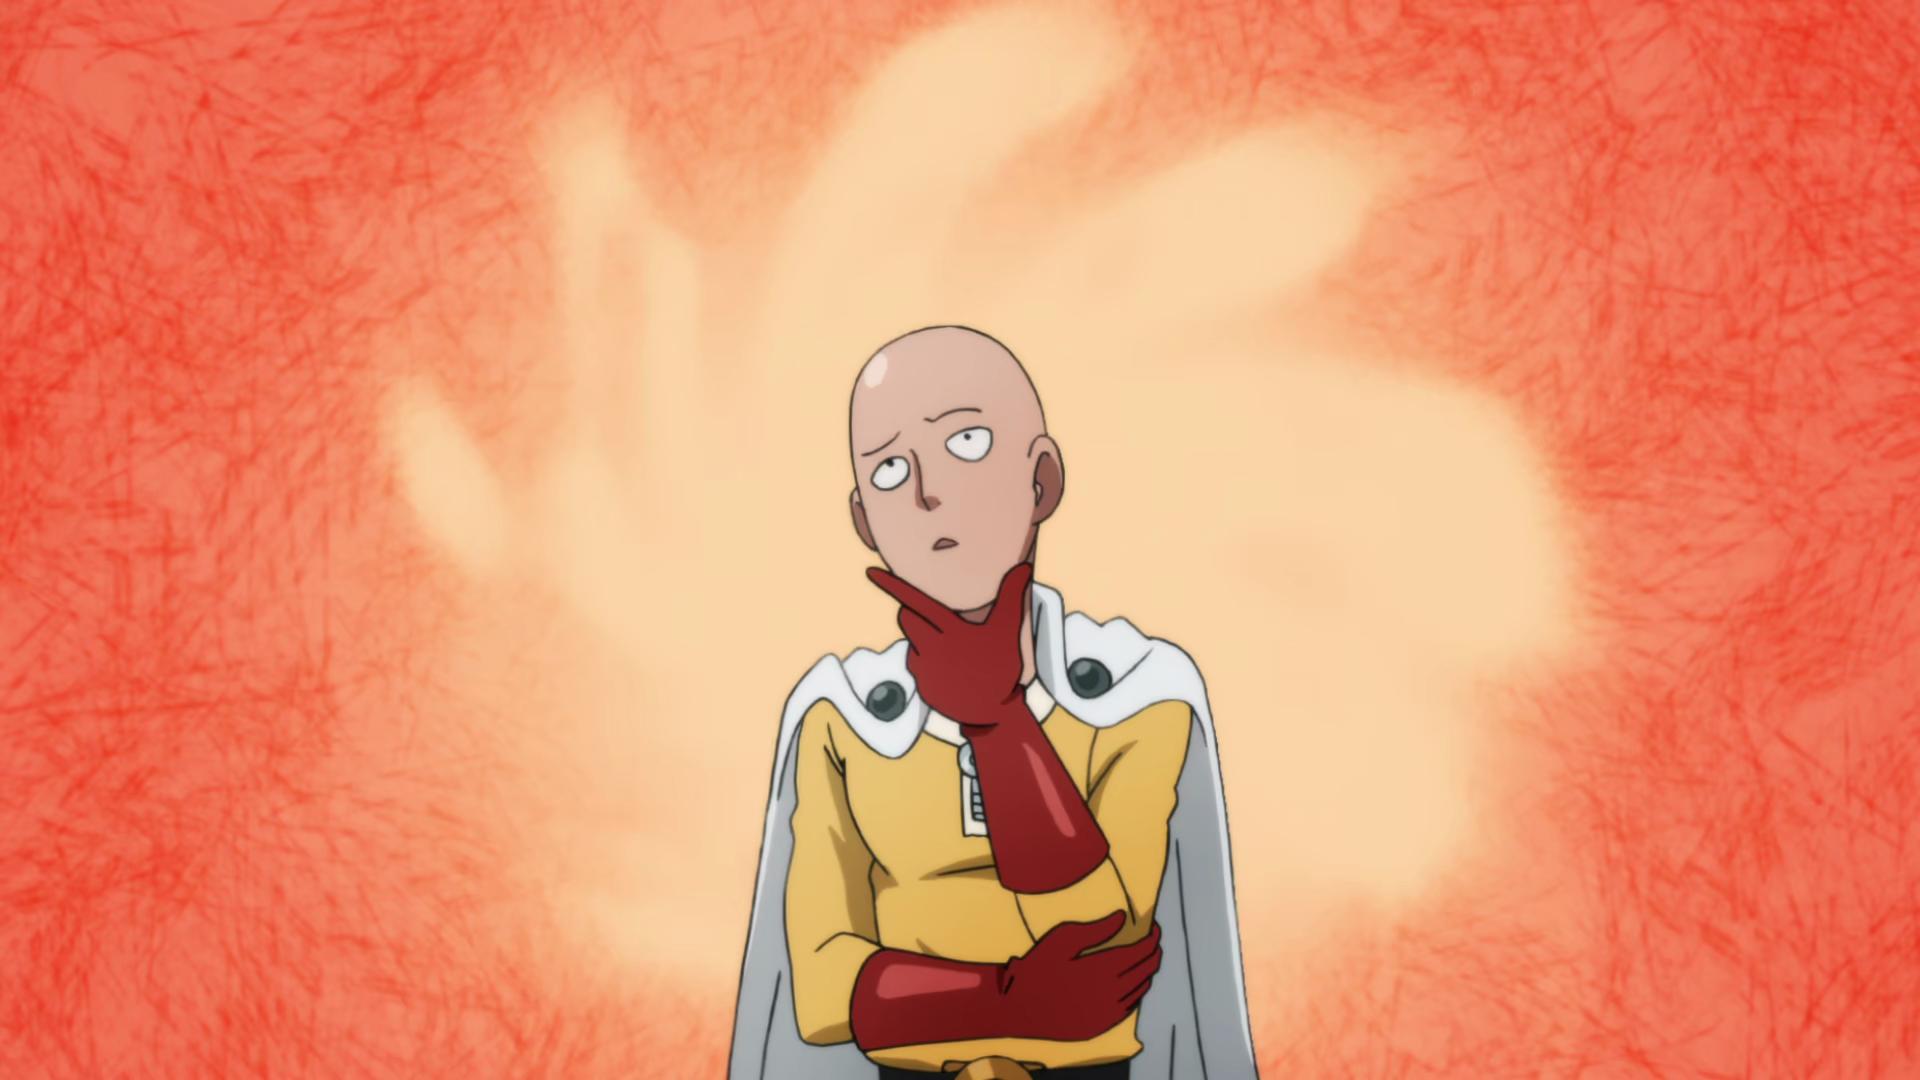 Anime 1920x1080 One-Punch Man Saitama bald